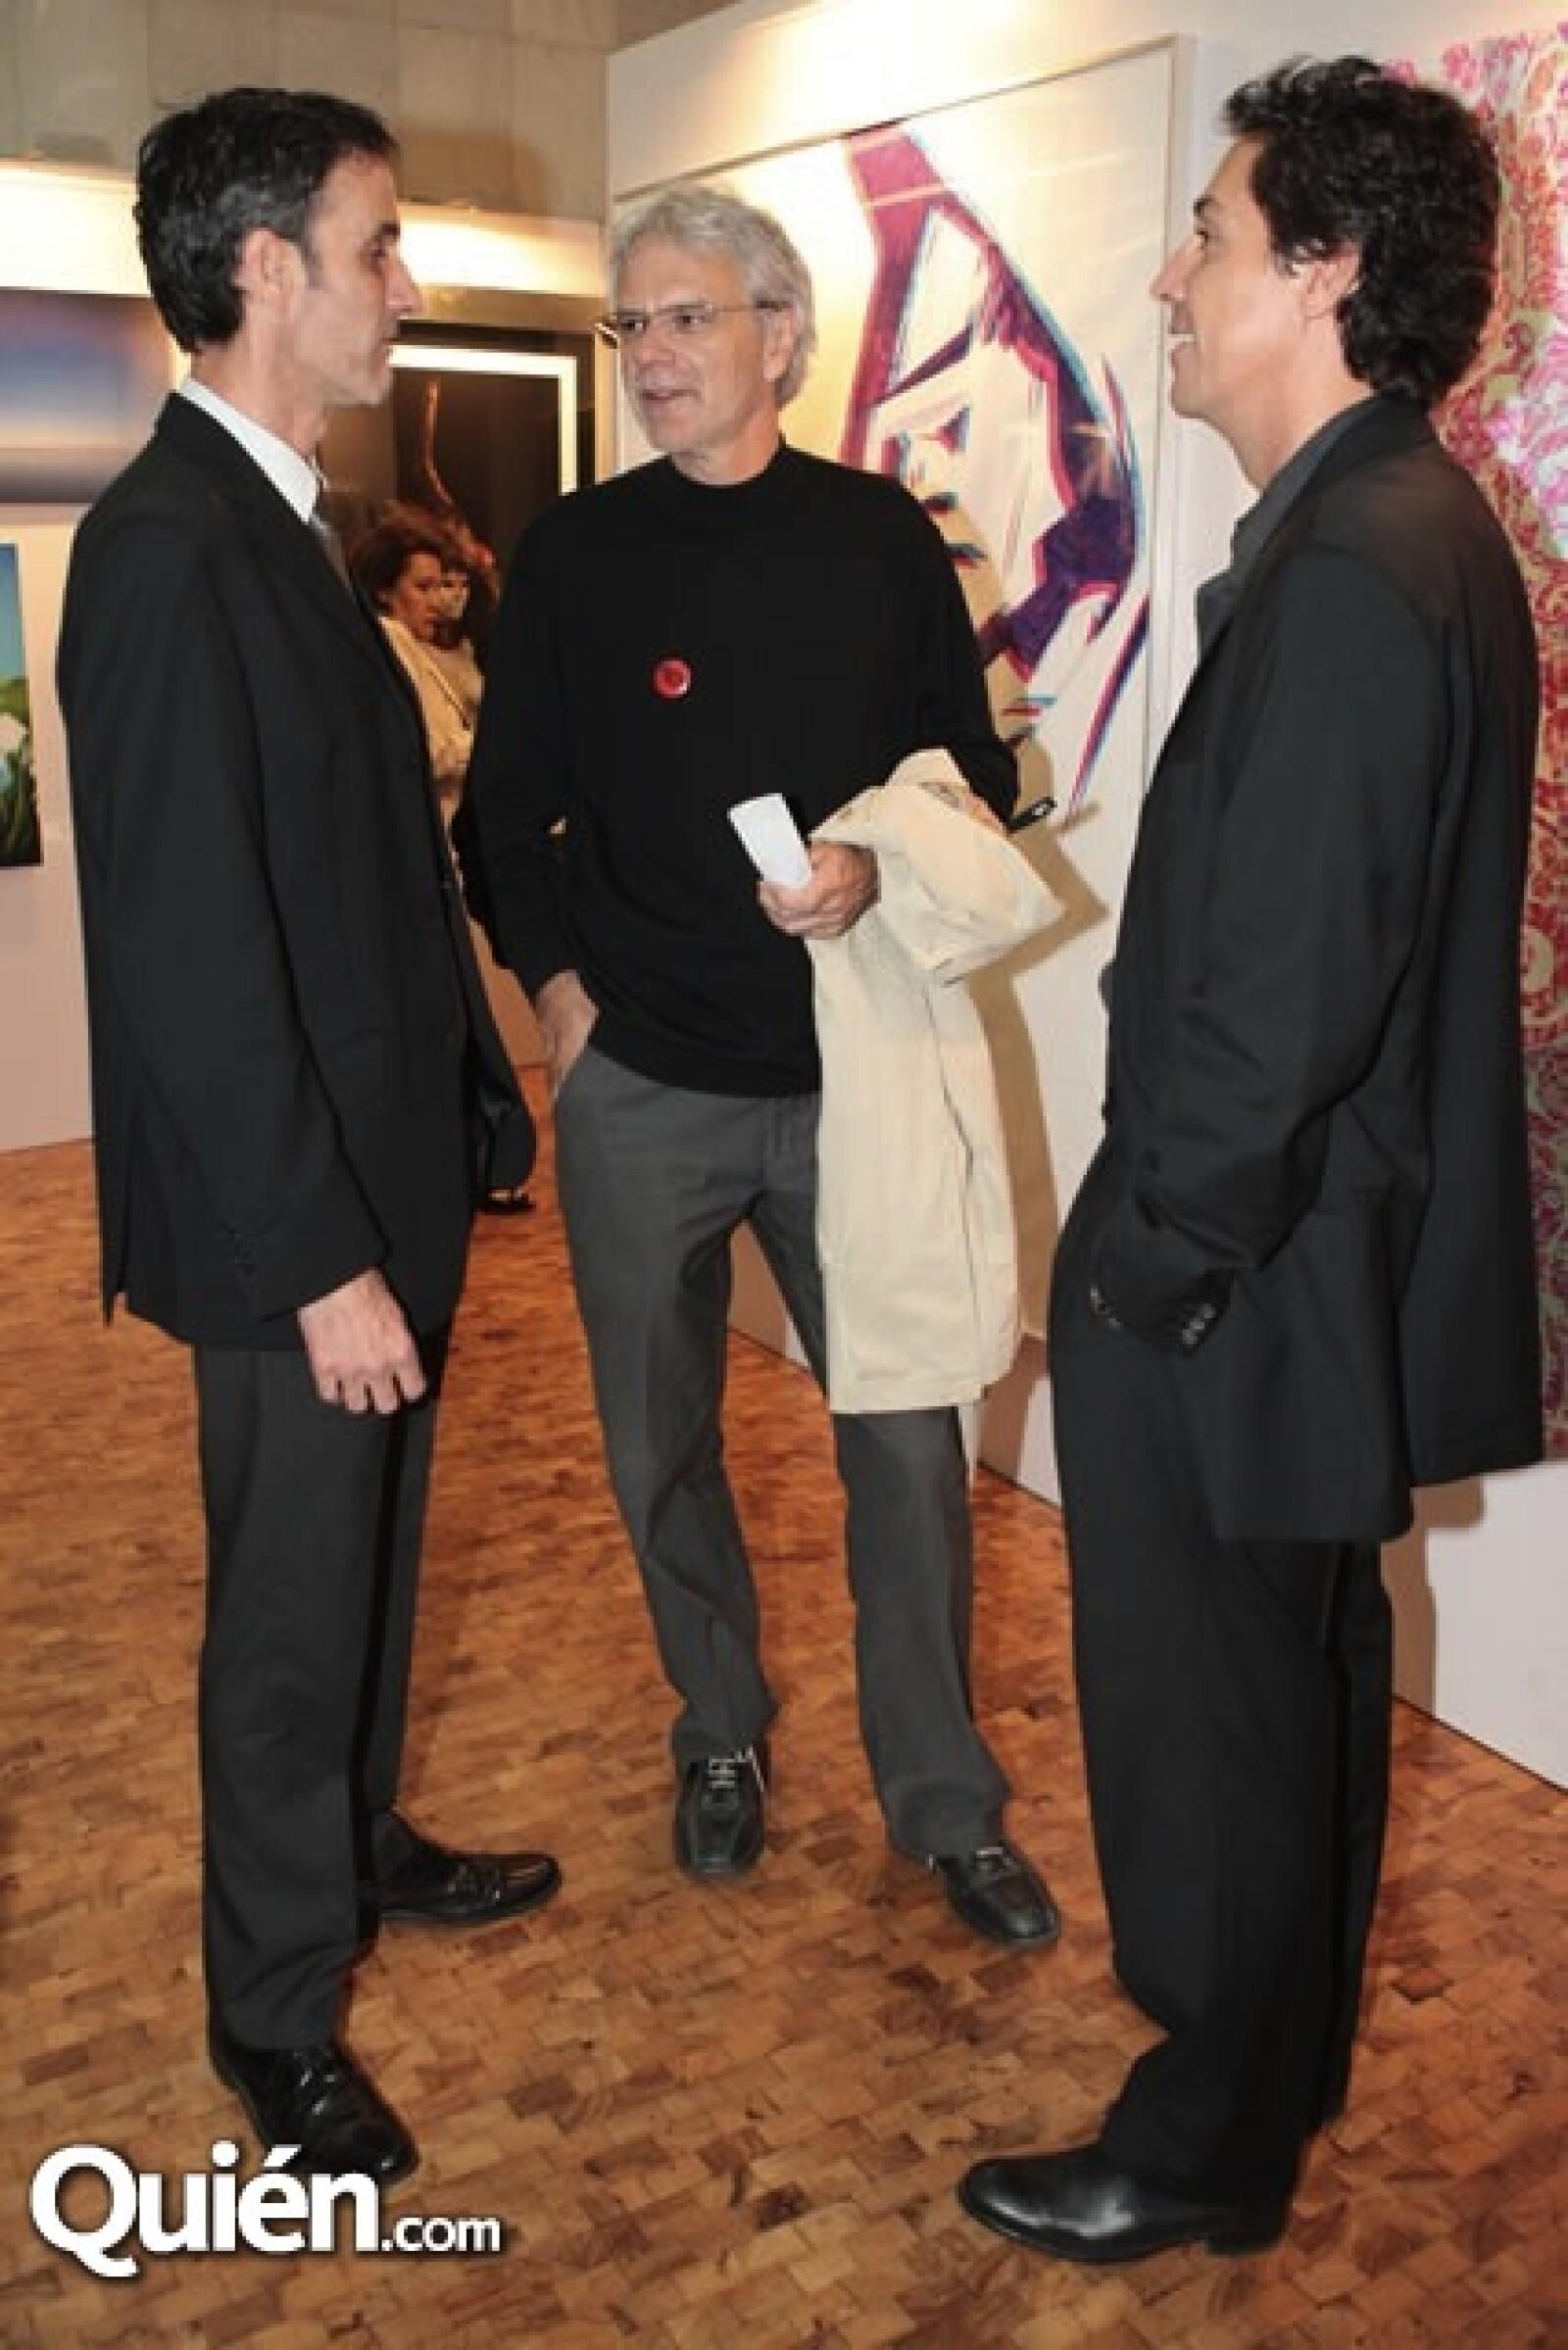 Luis Pastrana, Patrick Silvier, Christian Vizl